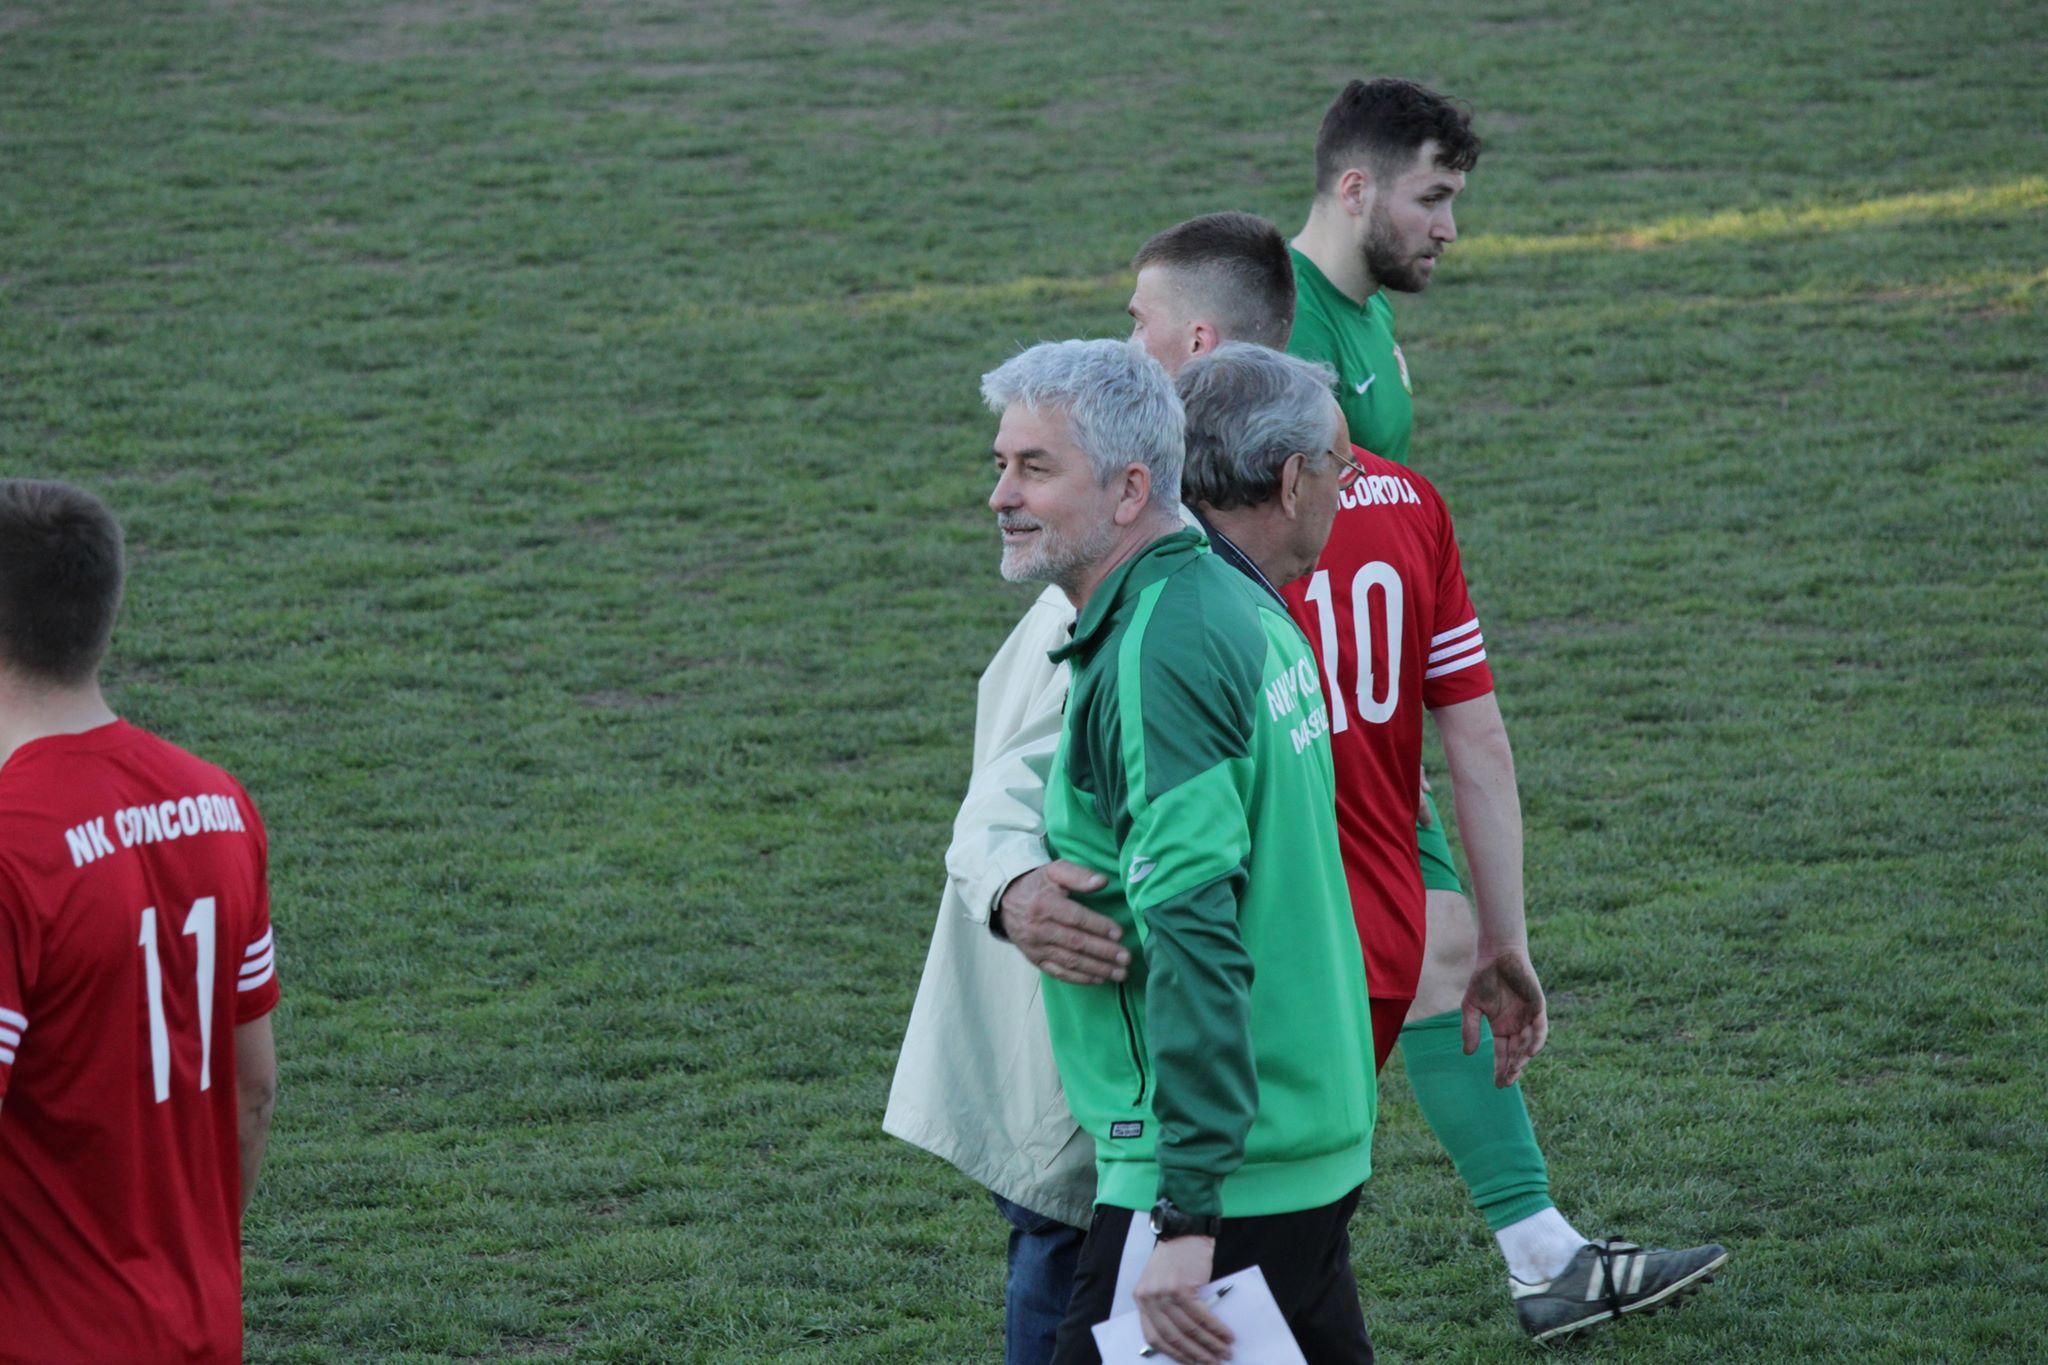 zvonko-lipovac-odstupio-davor-pavlov-novi-trener-seniorske-momcadi